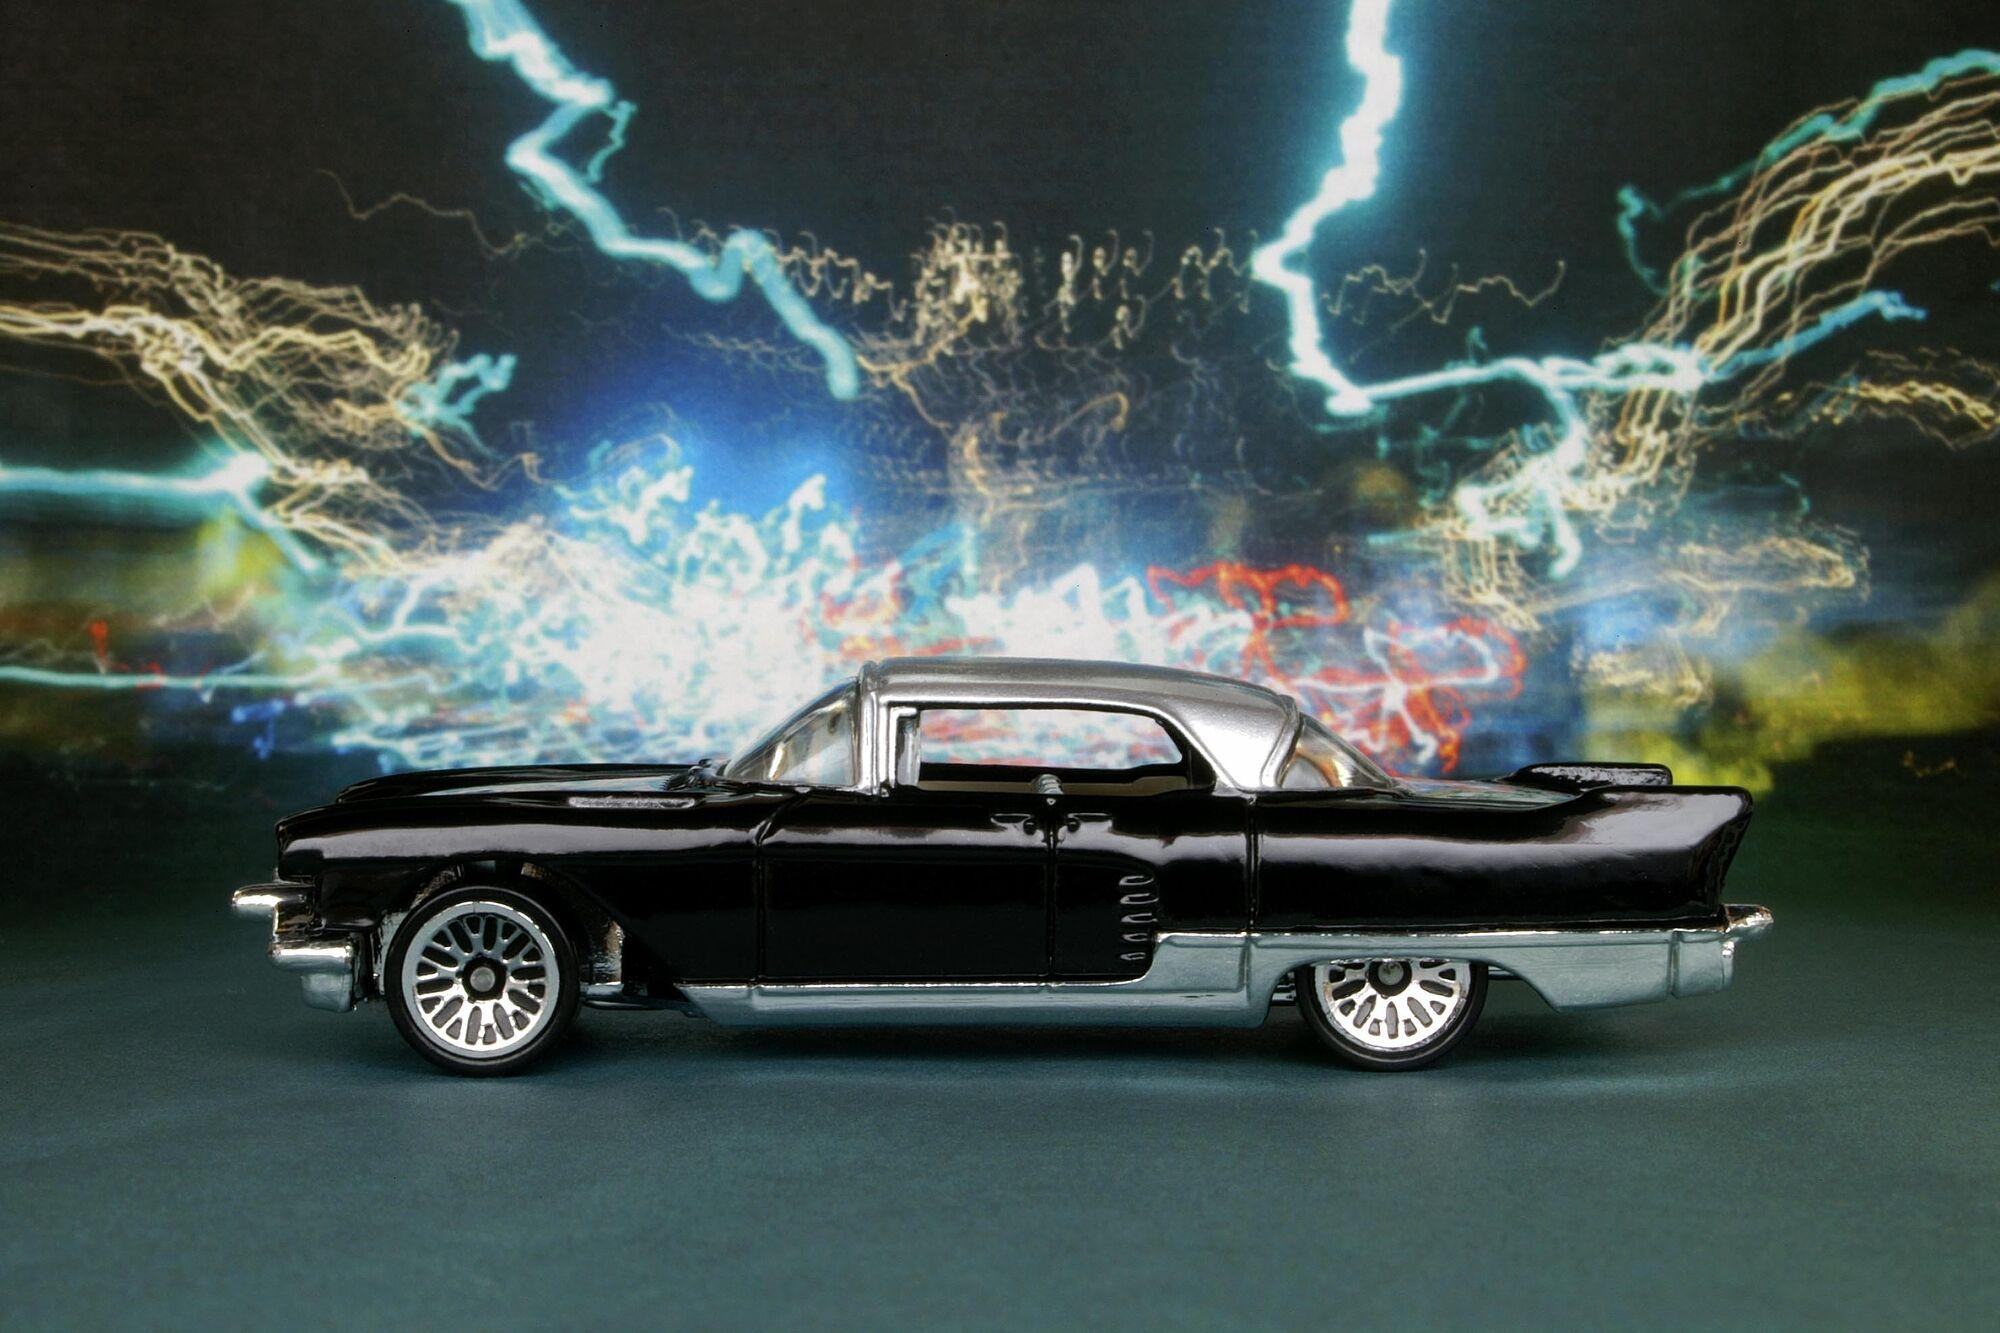 57 Cadillac Eldorado Brougham Hot Wheels Wiki FANDOM